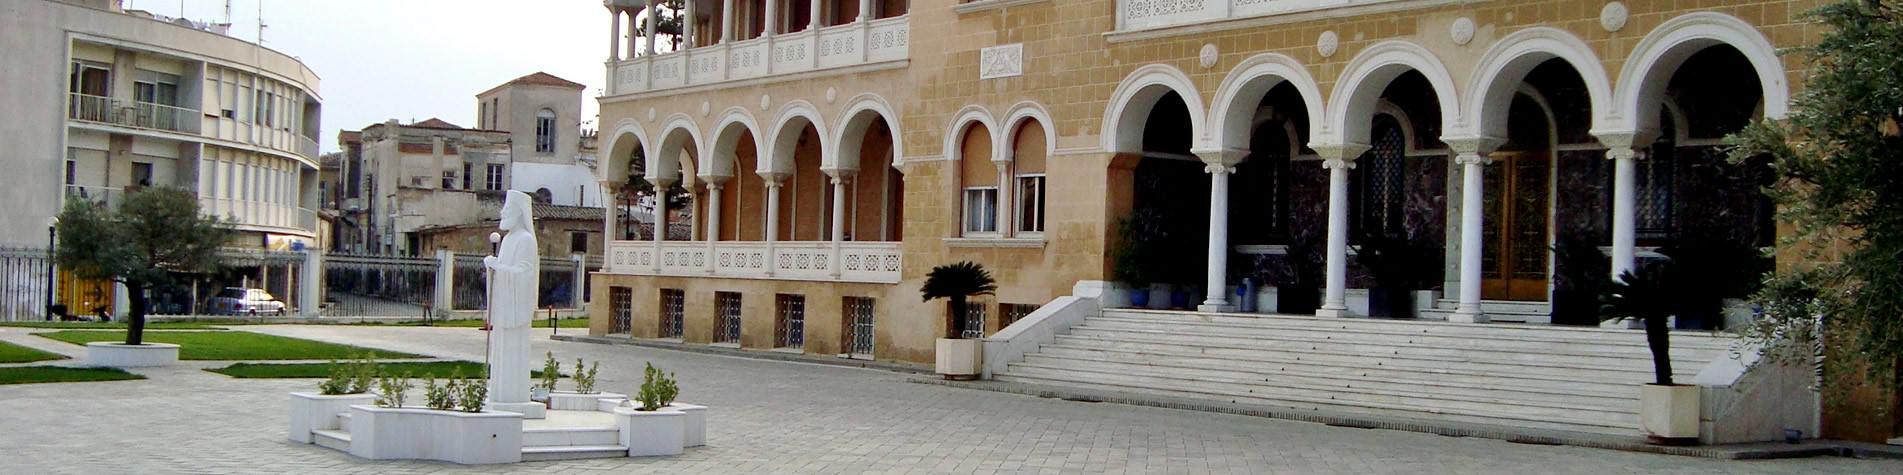 Nicosia Holidays with Cyplon Holidays